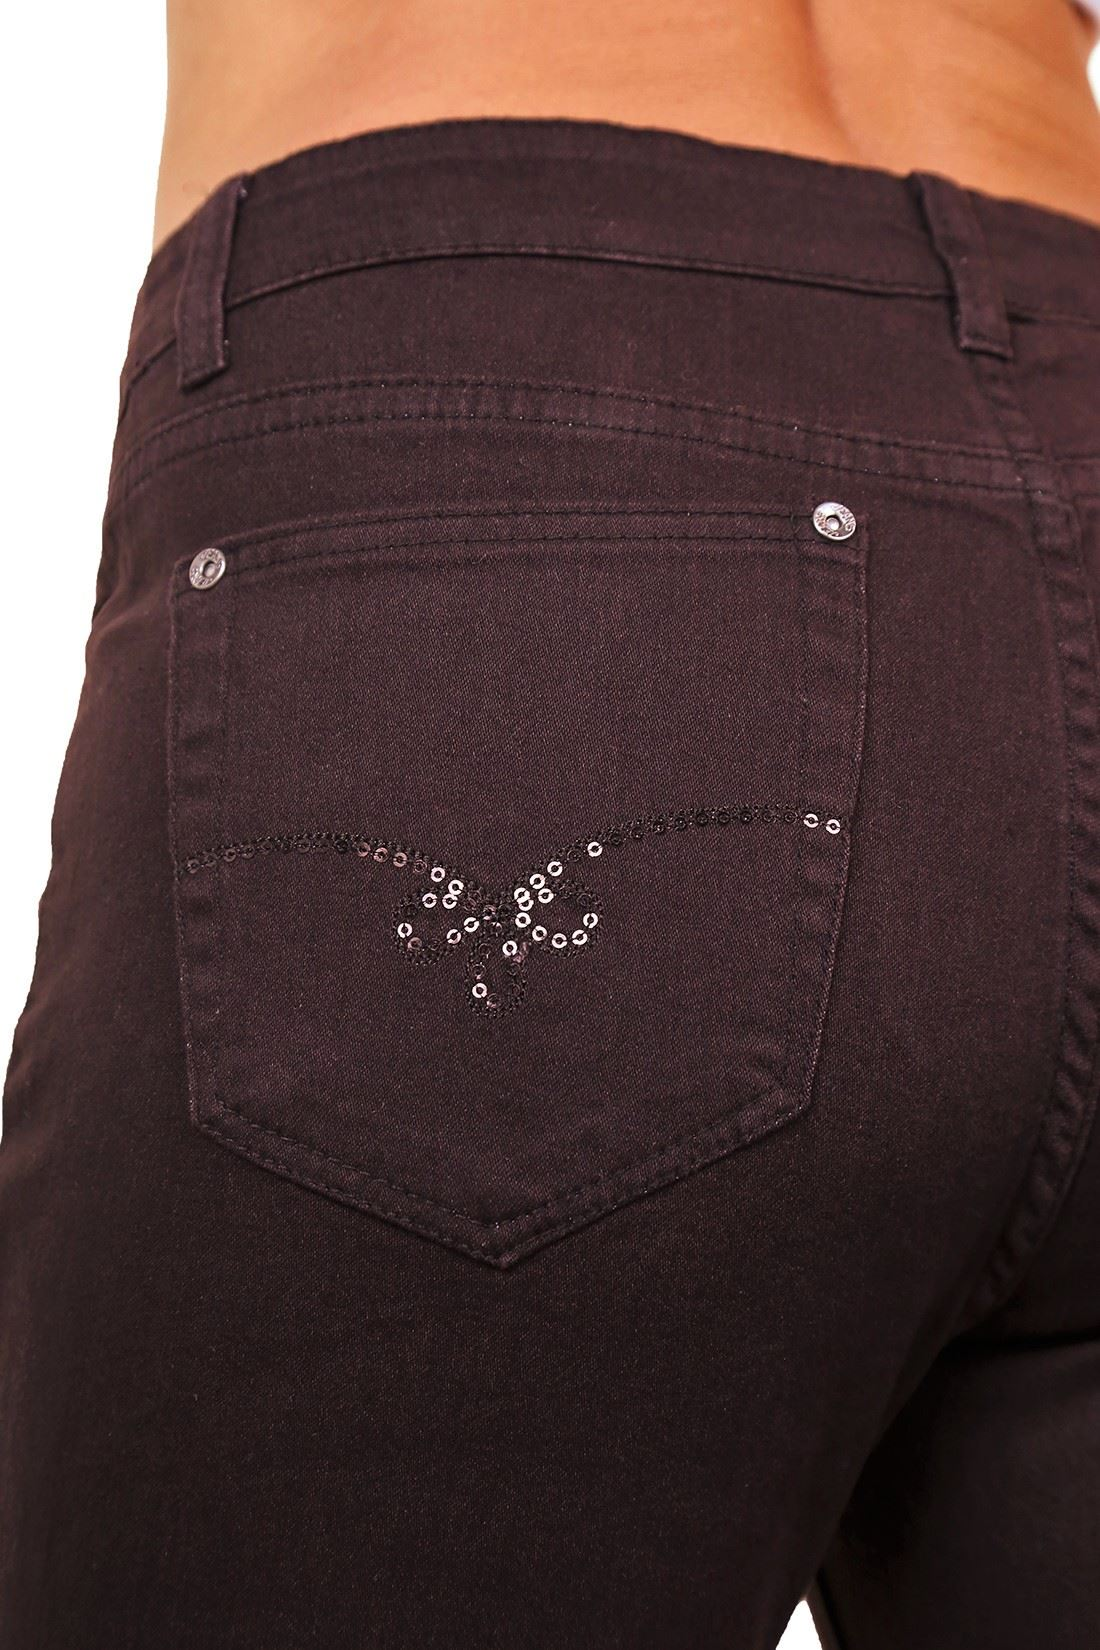 Ladies Plus Size Straight Leg High Waist Stretch Denim Jeans Full Length 14-24